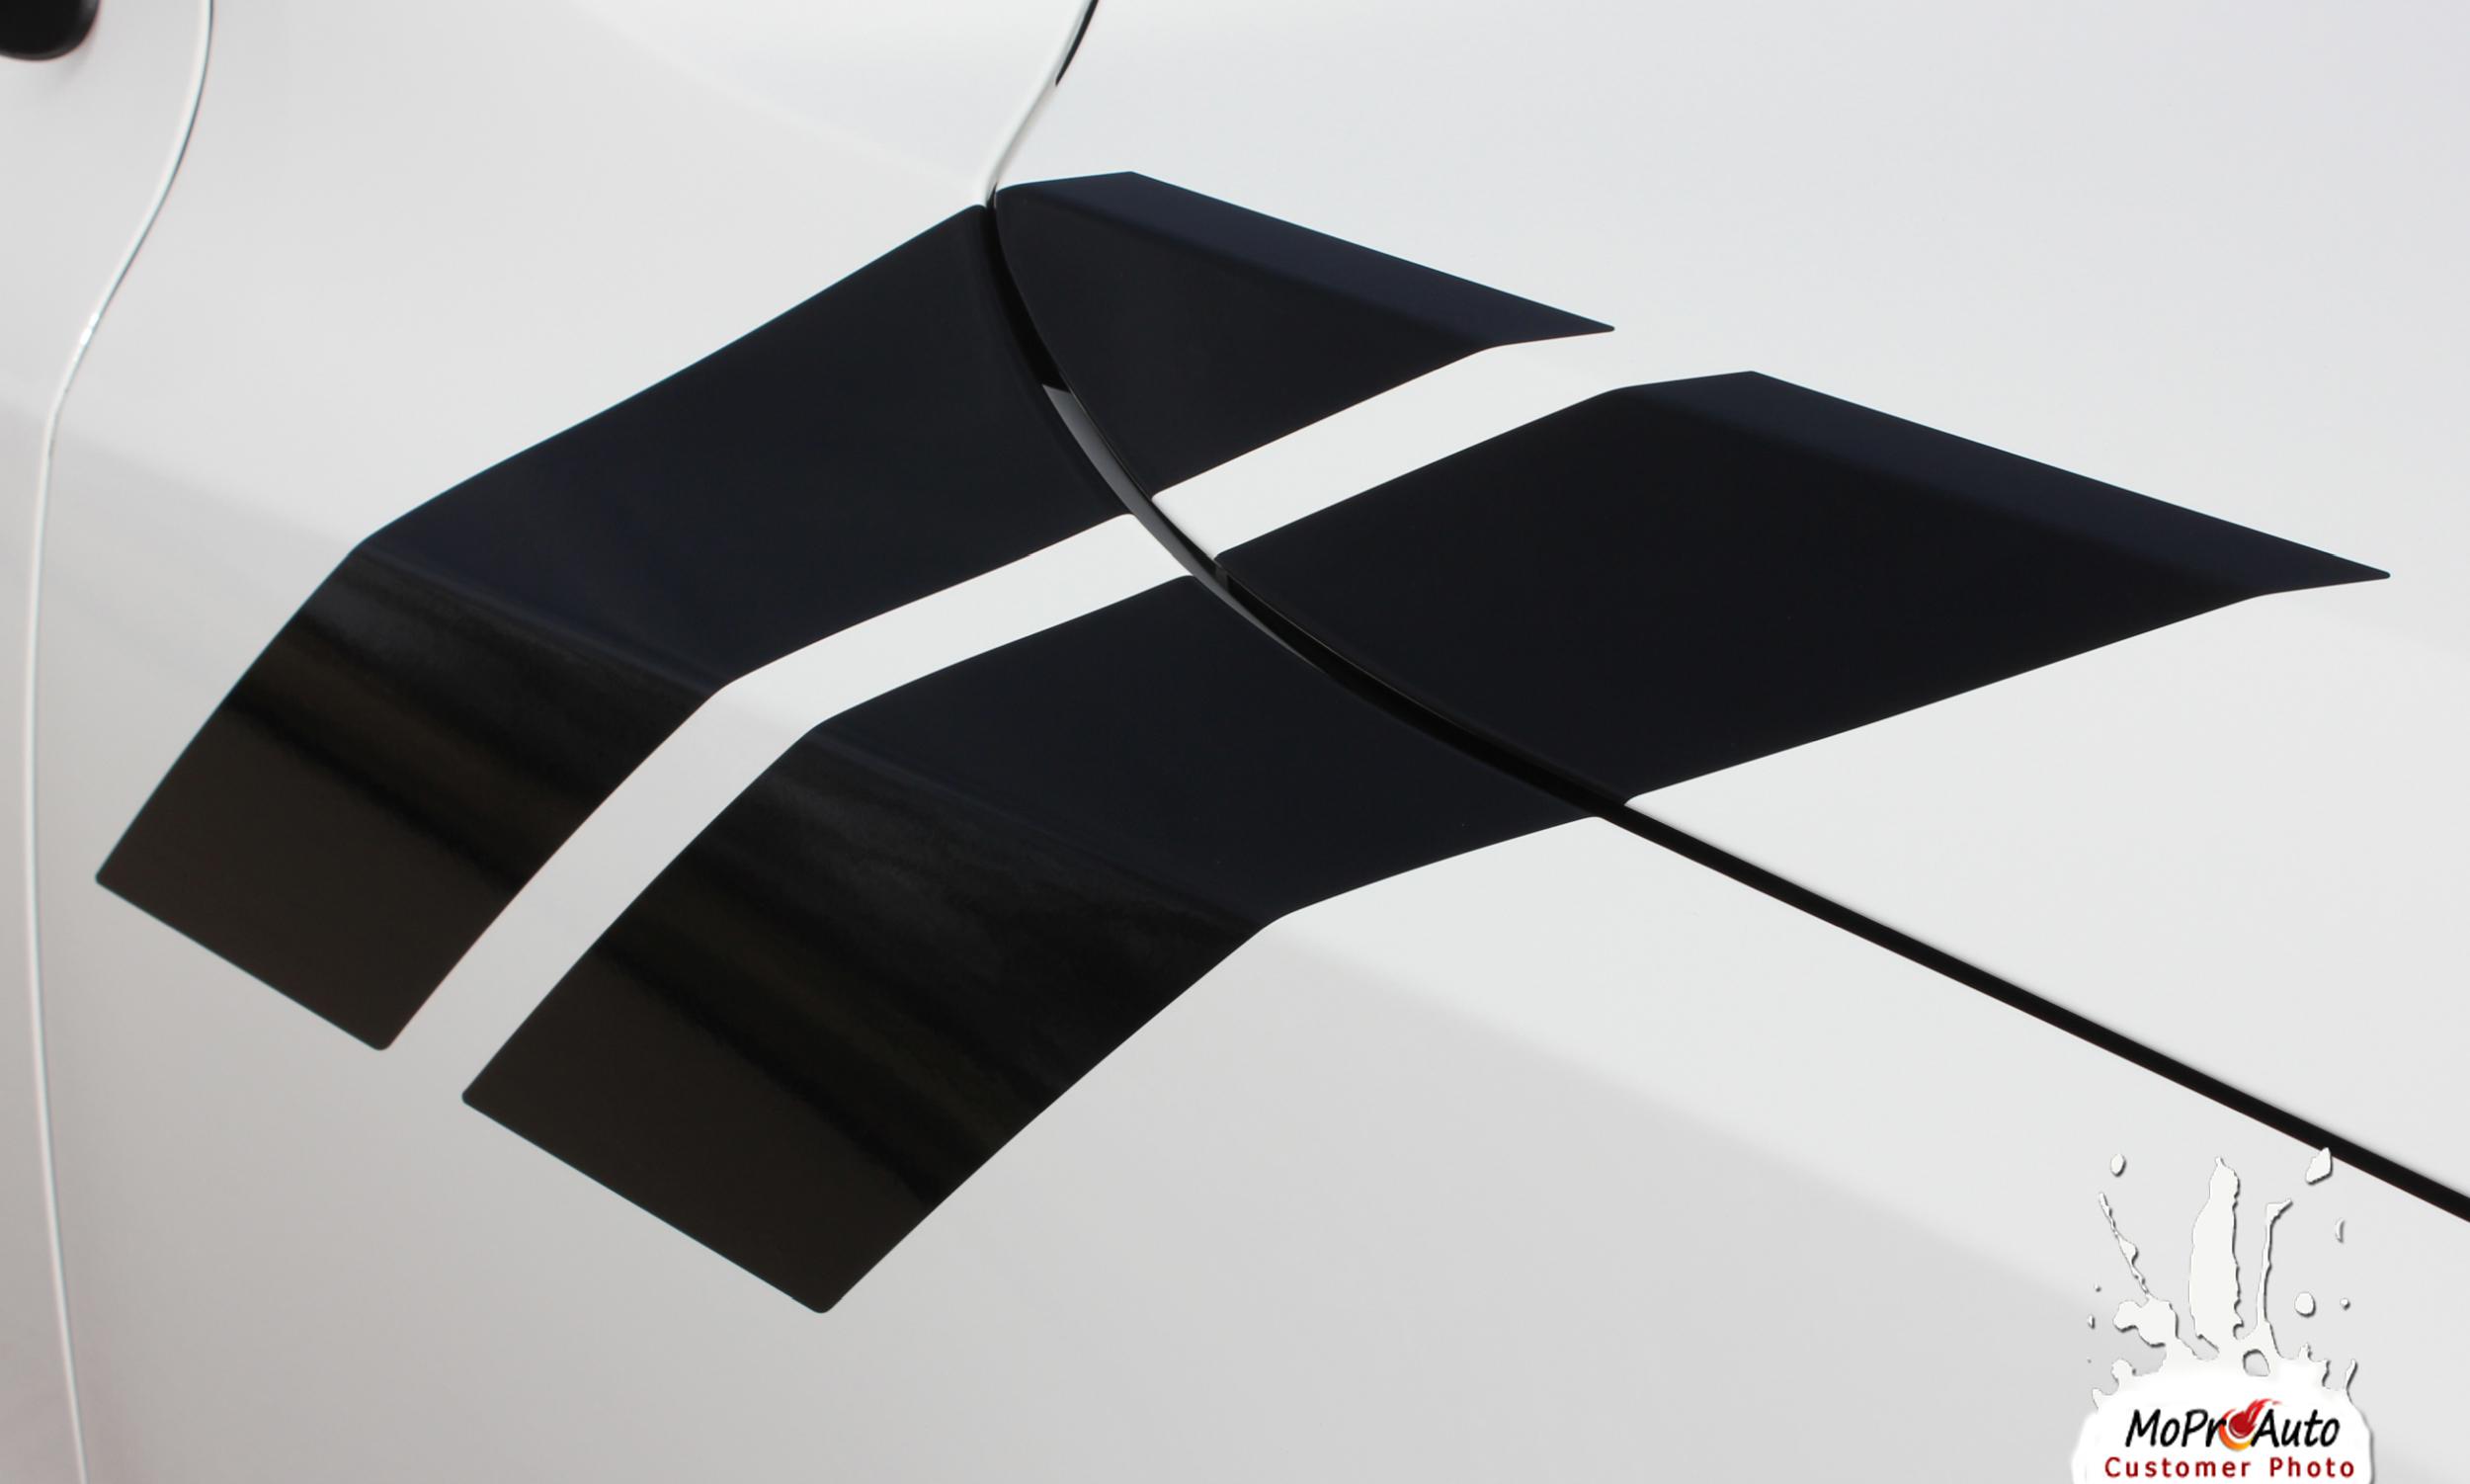 DURANGO DOUBLE BAR | 2011 2012 2013 2014 2015 2016 2017 2018 Dodge Durango Hood Hash Marks Vinyl Graphics Kit MoProAuto Pro Design Series